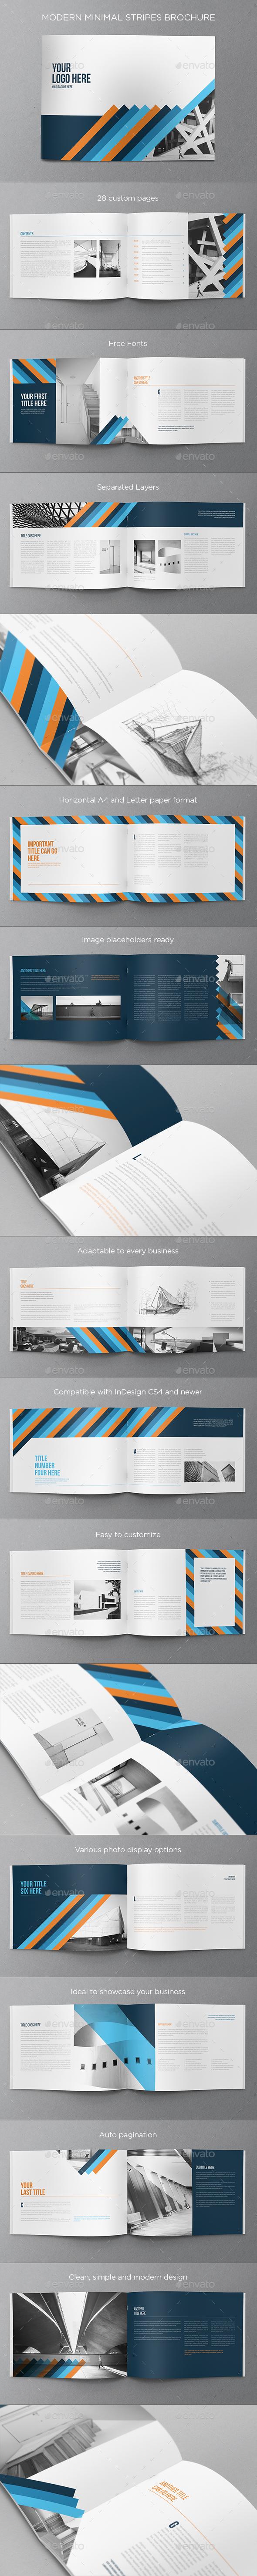 Modern Minimal Stripes Brochure - Brochures Print Templates